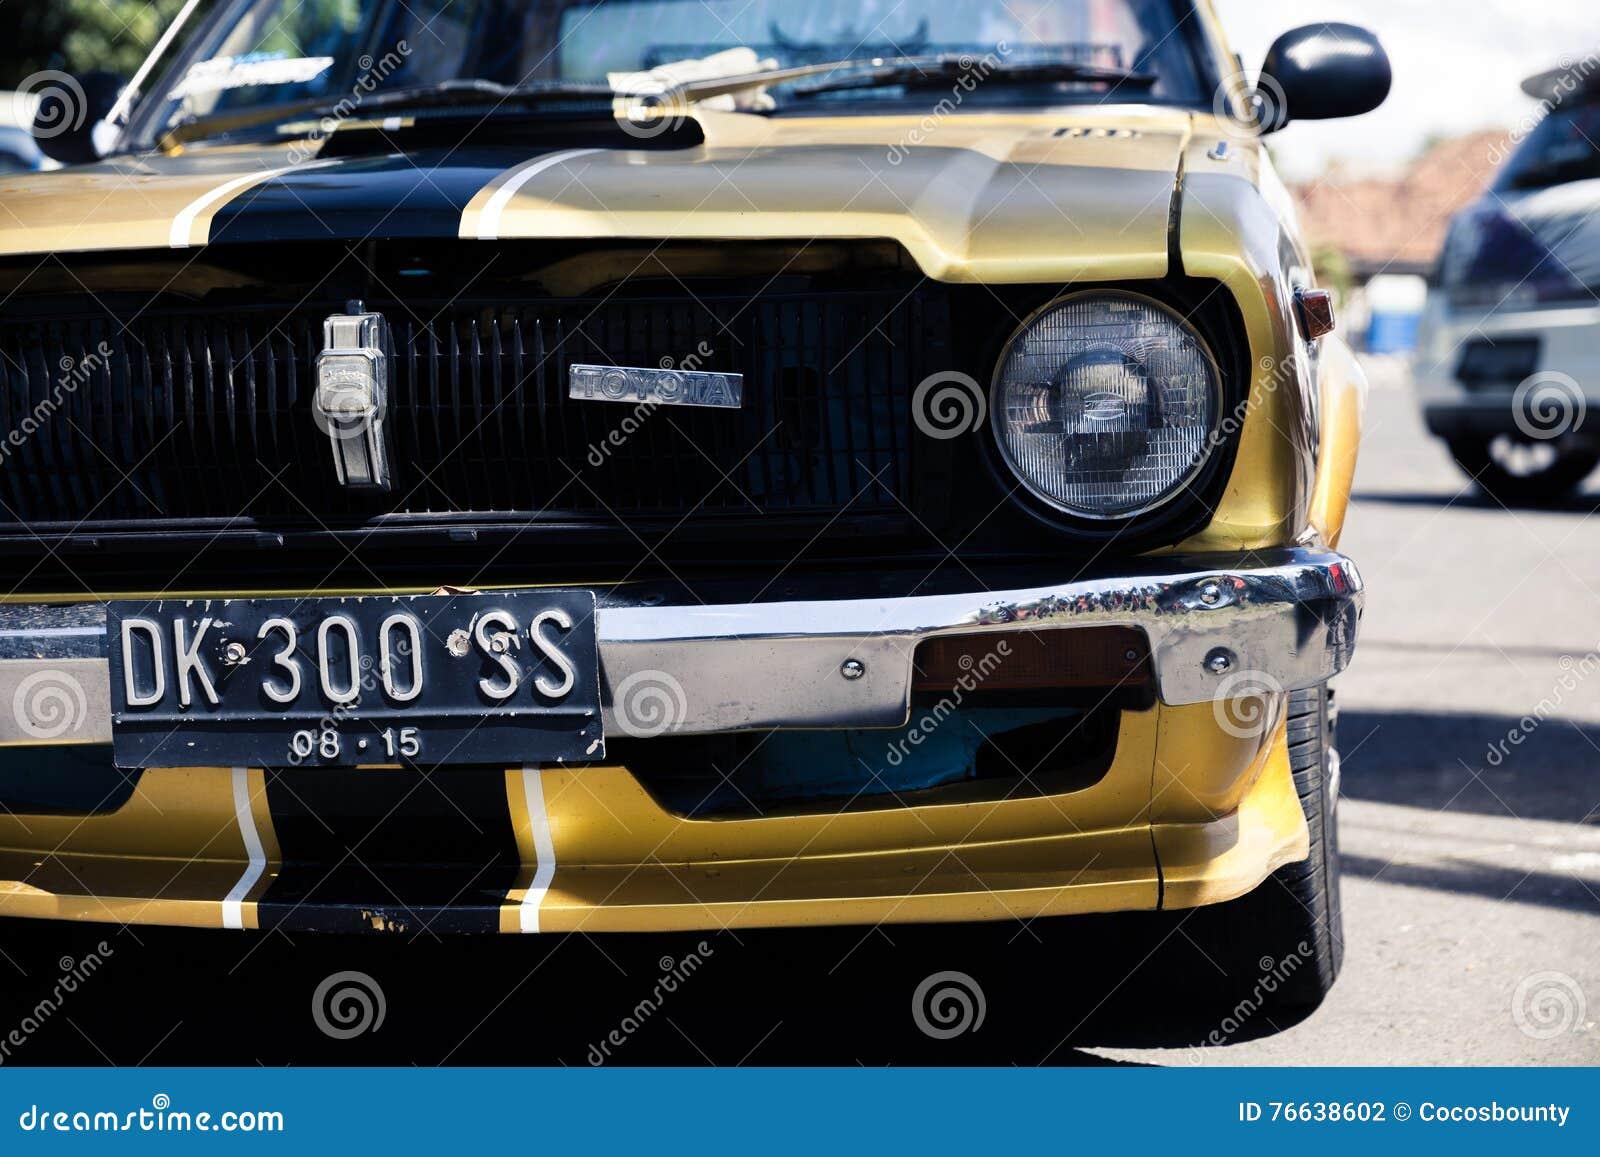 Confirm. was vintage car chrome remarkable phrase